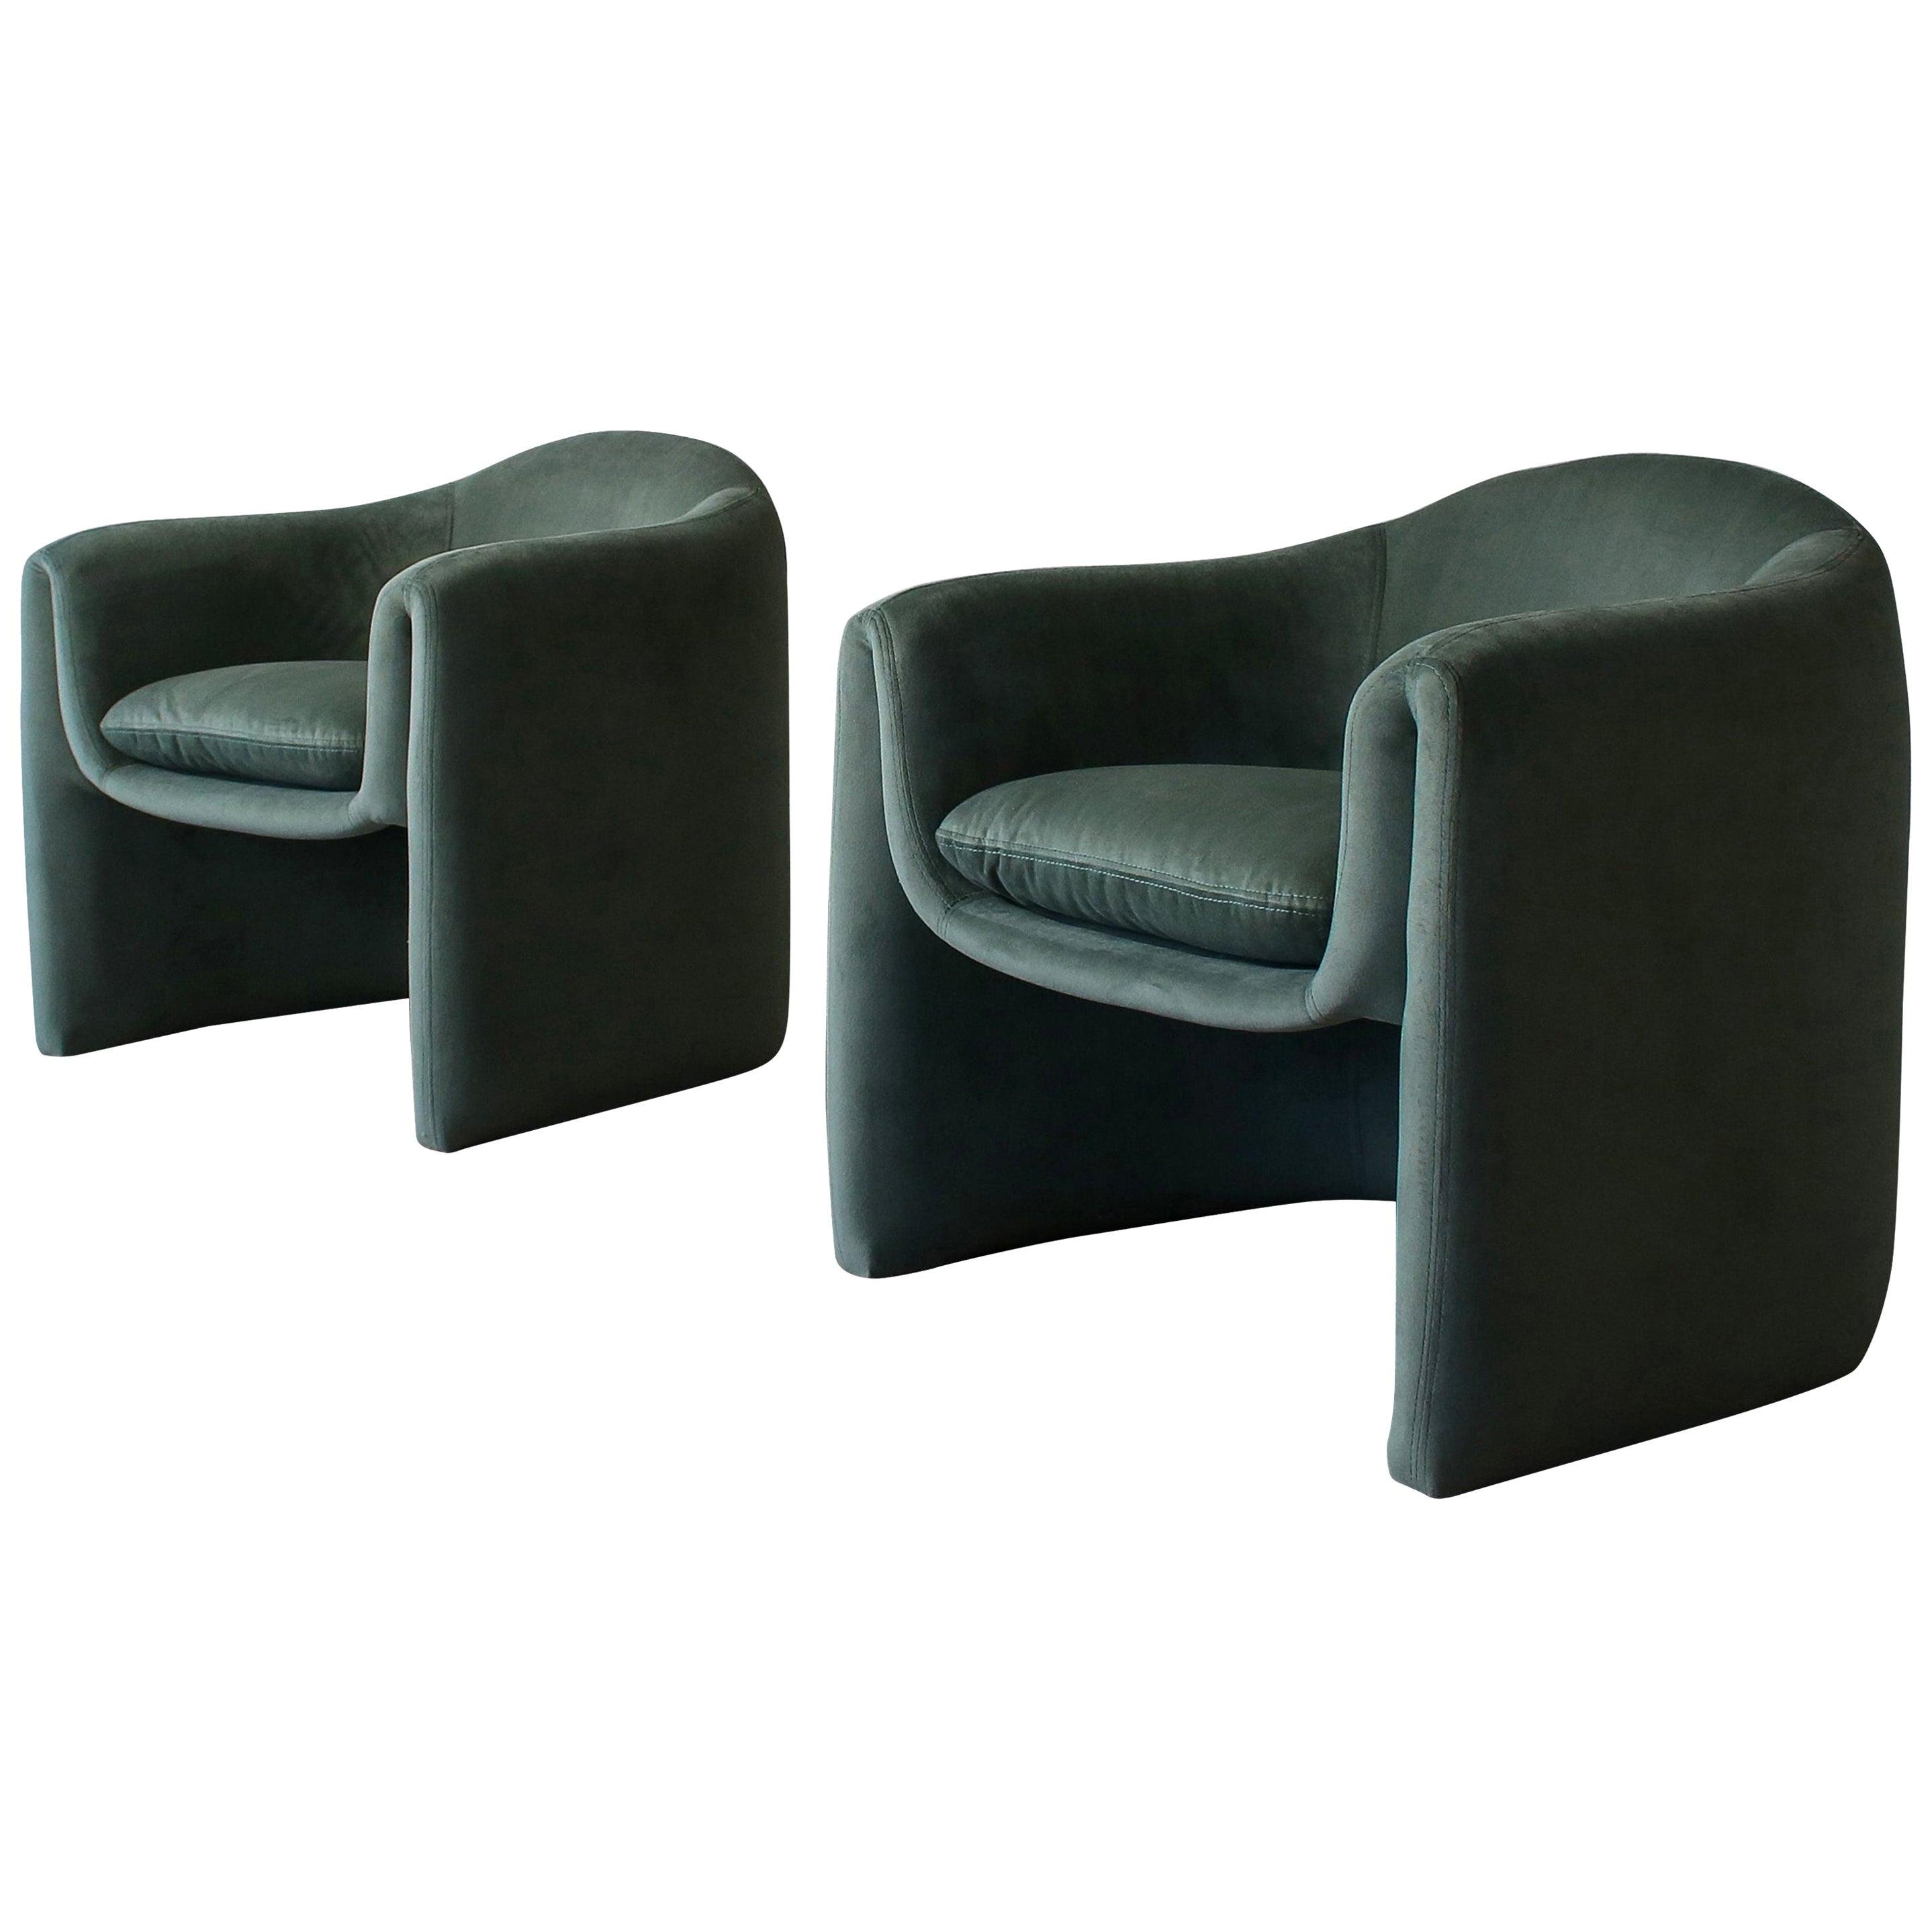 Pair of Postmodern Barrel Chairs